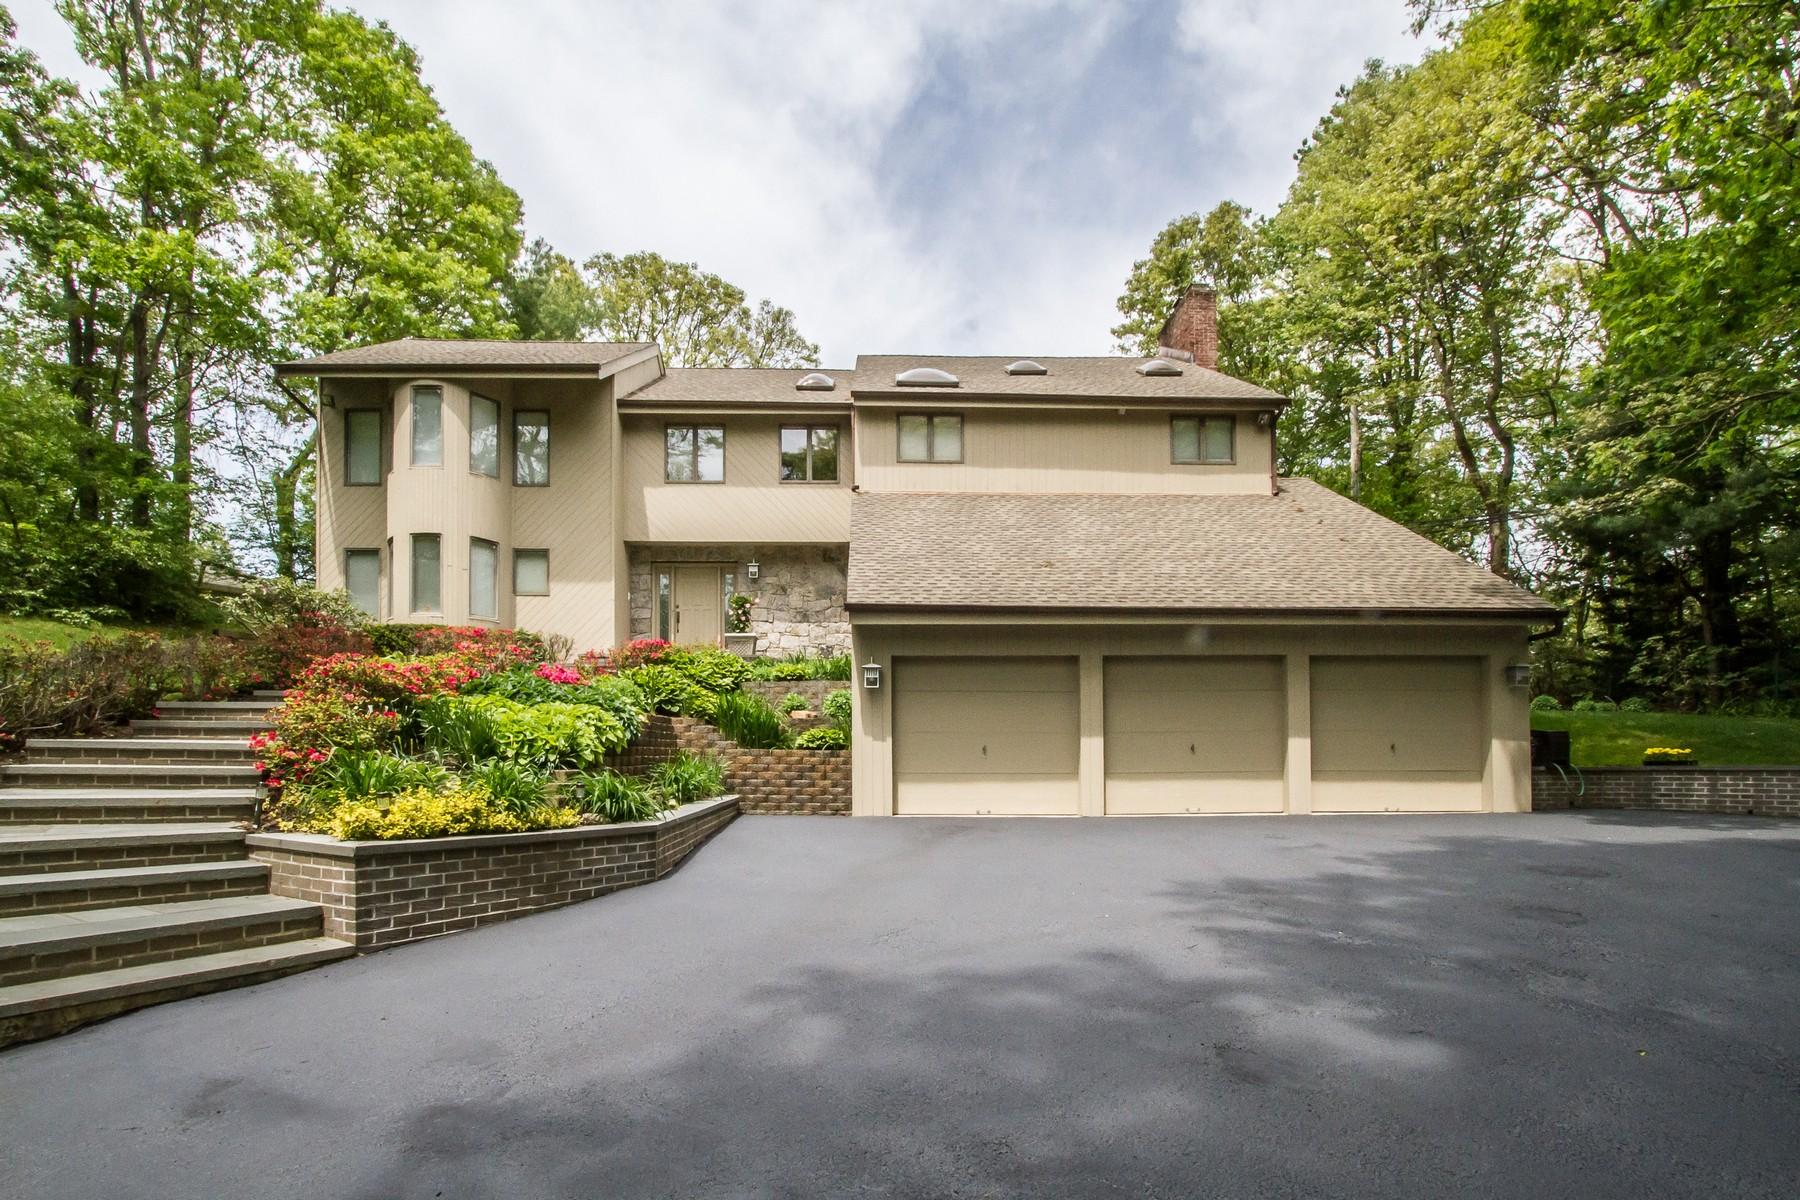 獨棟家庭住宅 為 出售 在 Colonial 55 Colonial Dr Huntington, 紐約州, 11743 美國